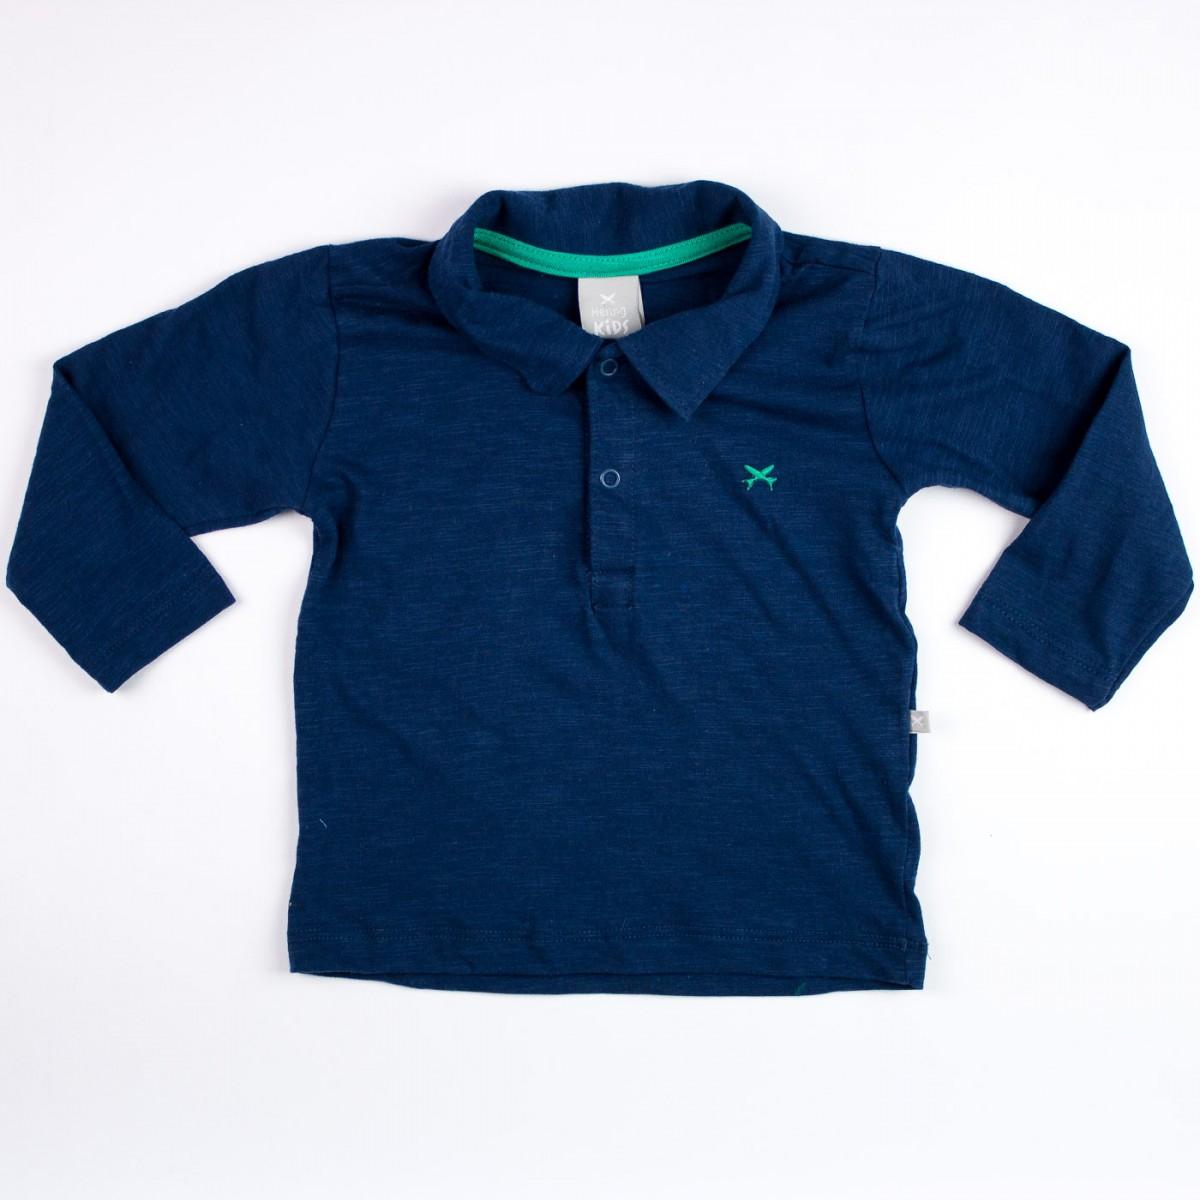 938fe8c579873 Bizz Store - Camiseta Polo Infantil Masculina Hering Kids Marinho